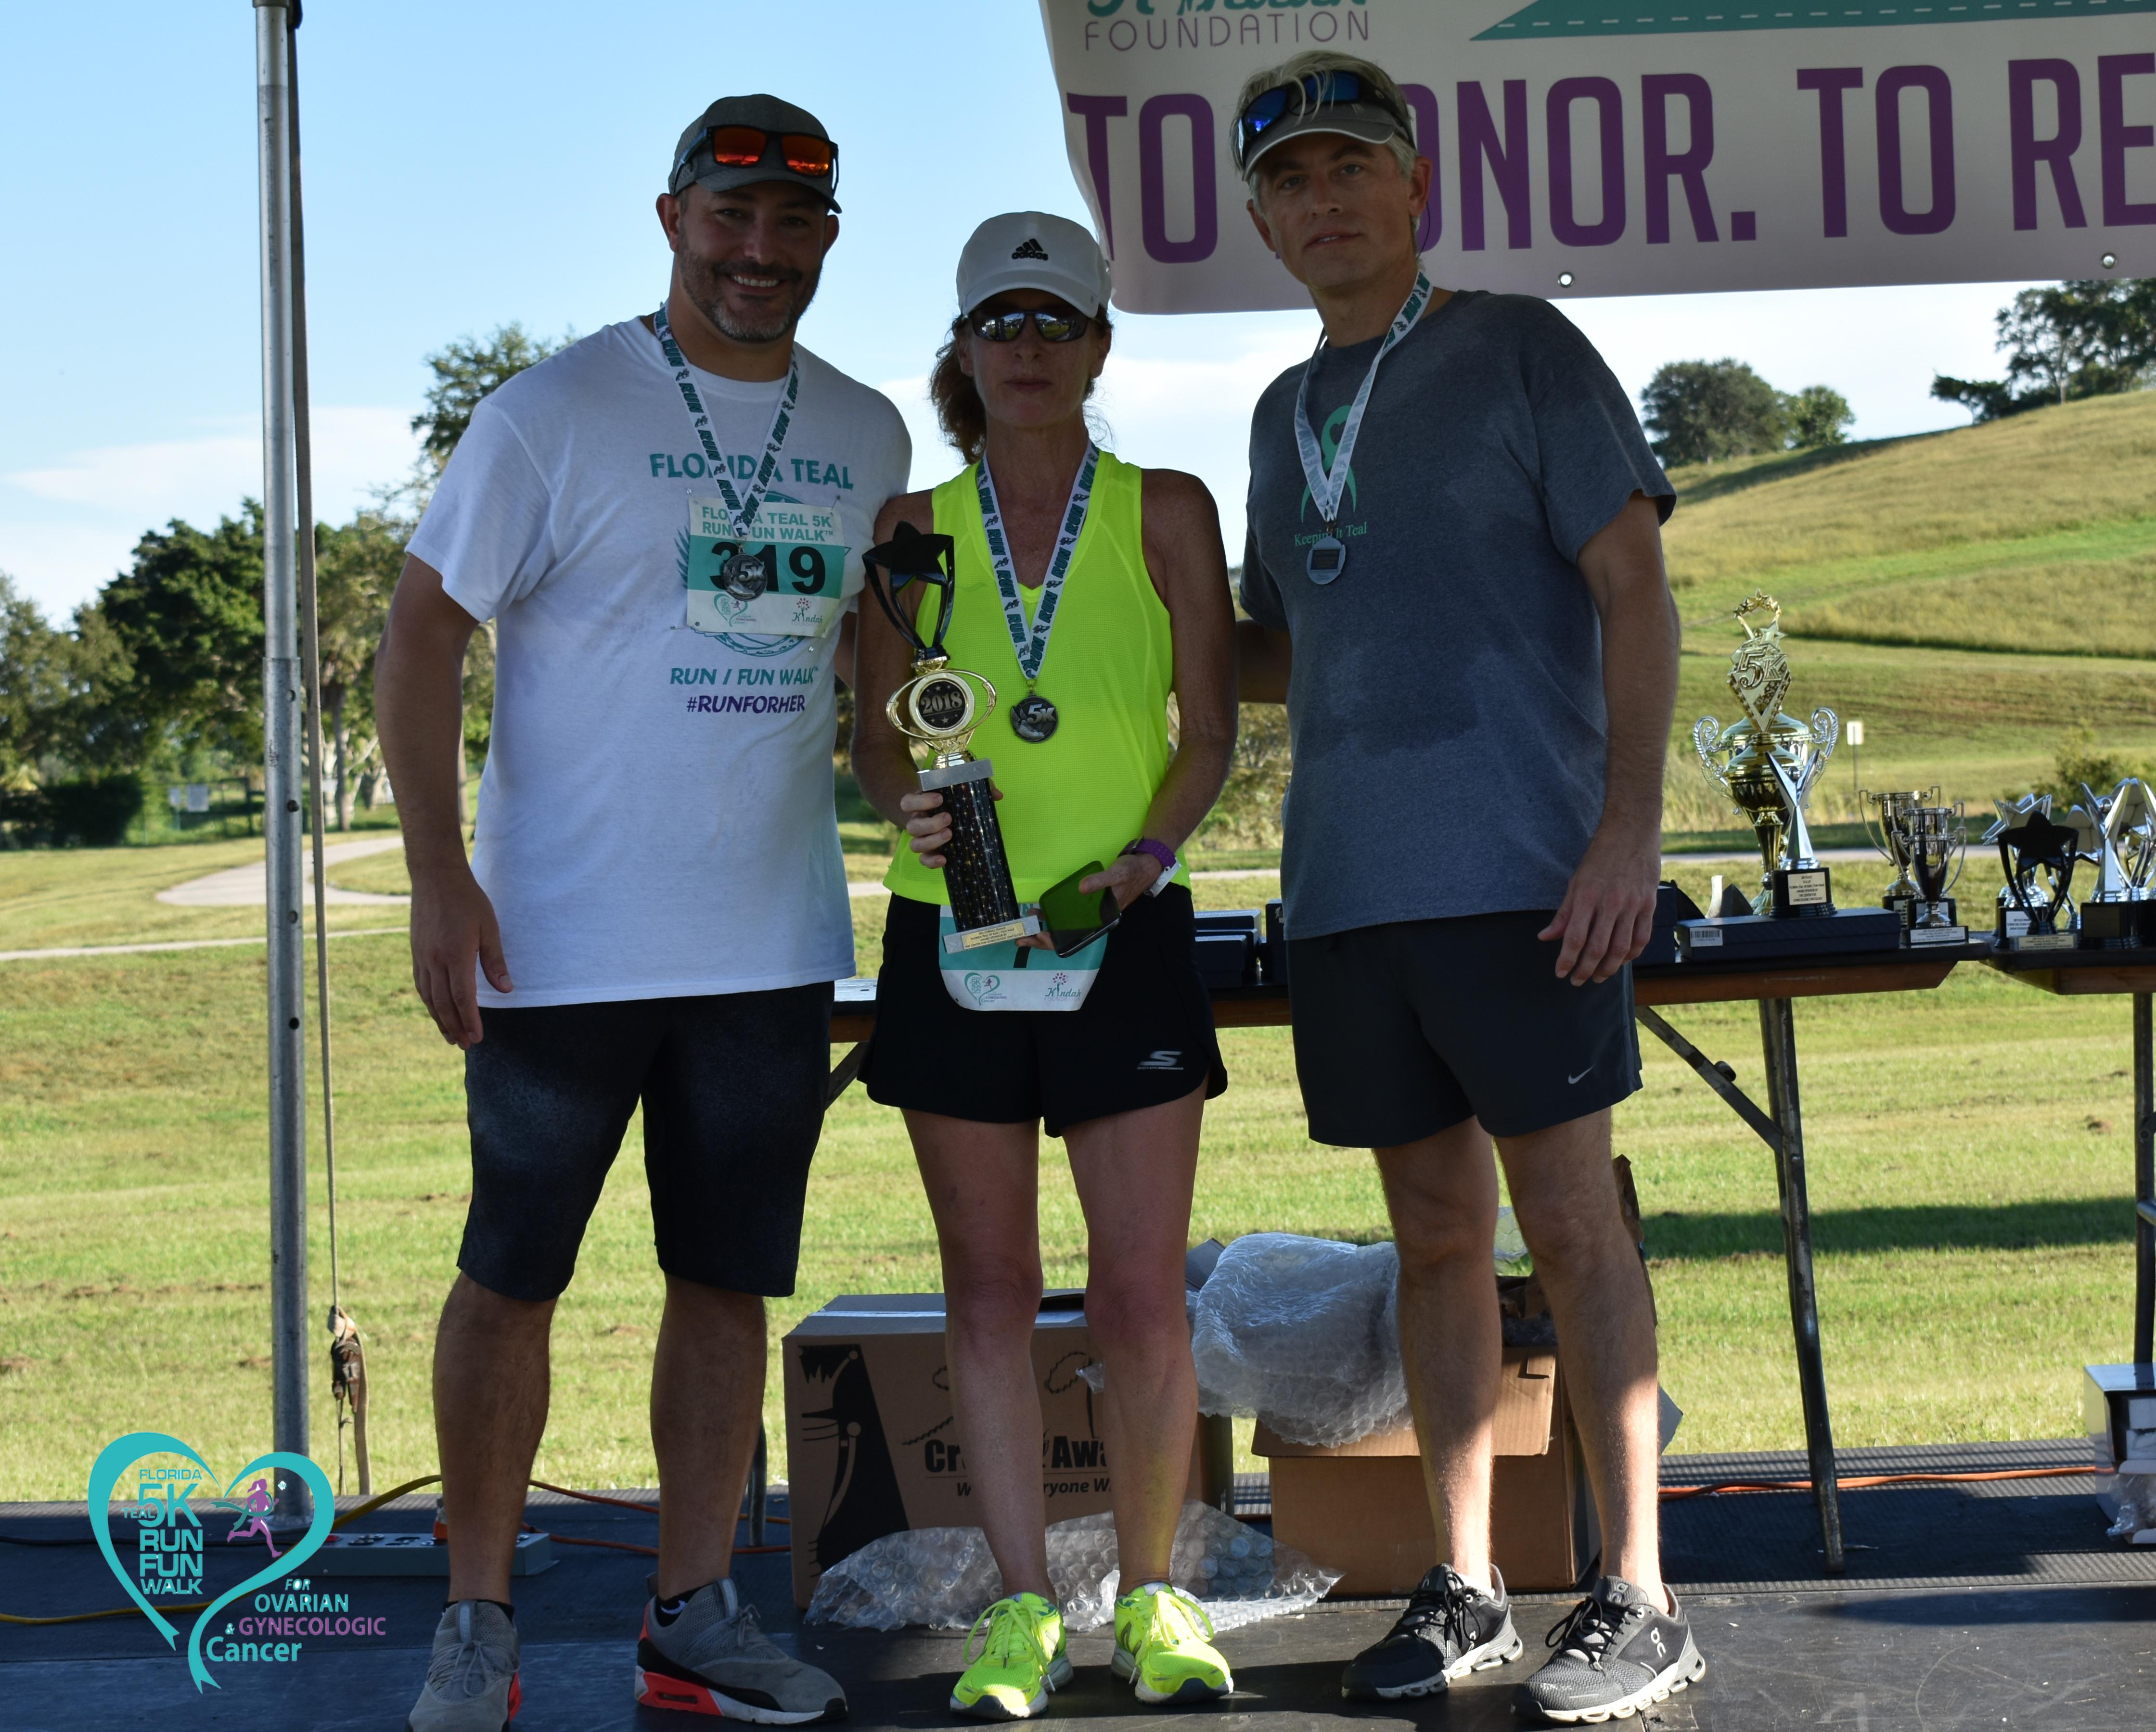 DSC 0187 - Florida Teal 5K Run & Fun